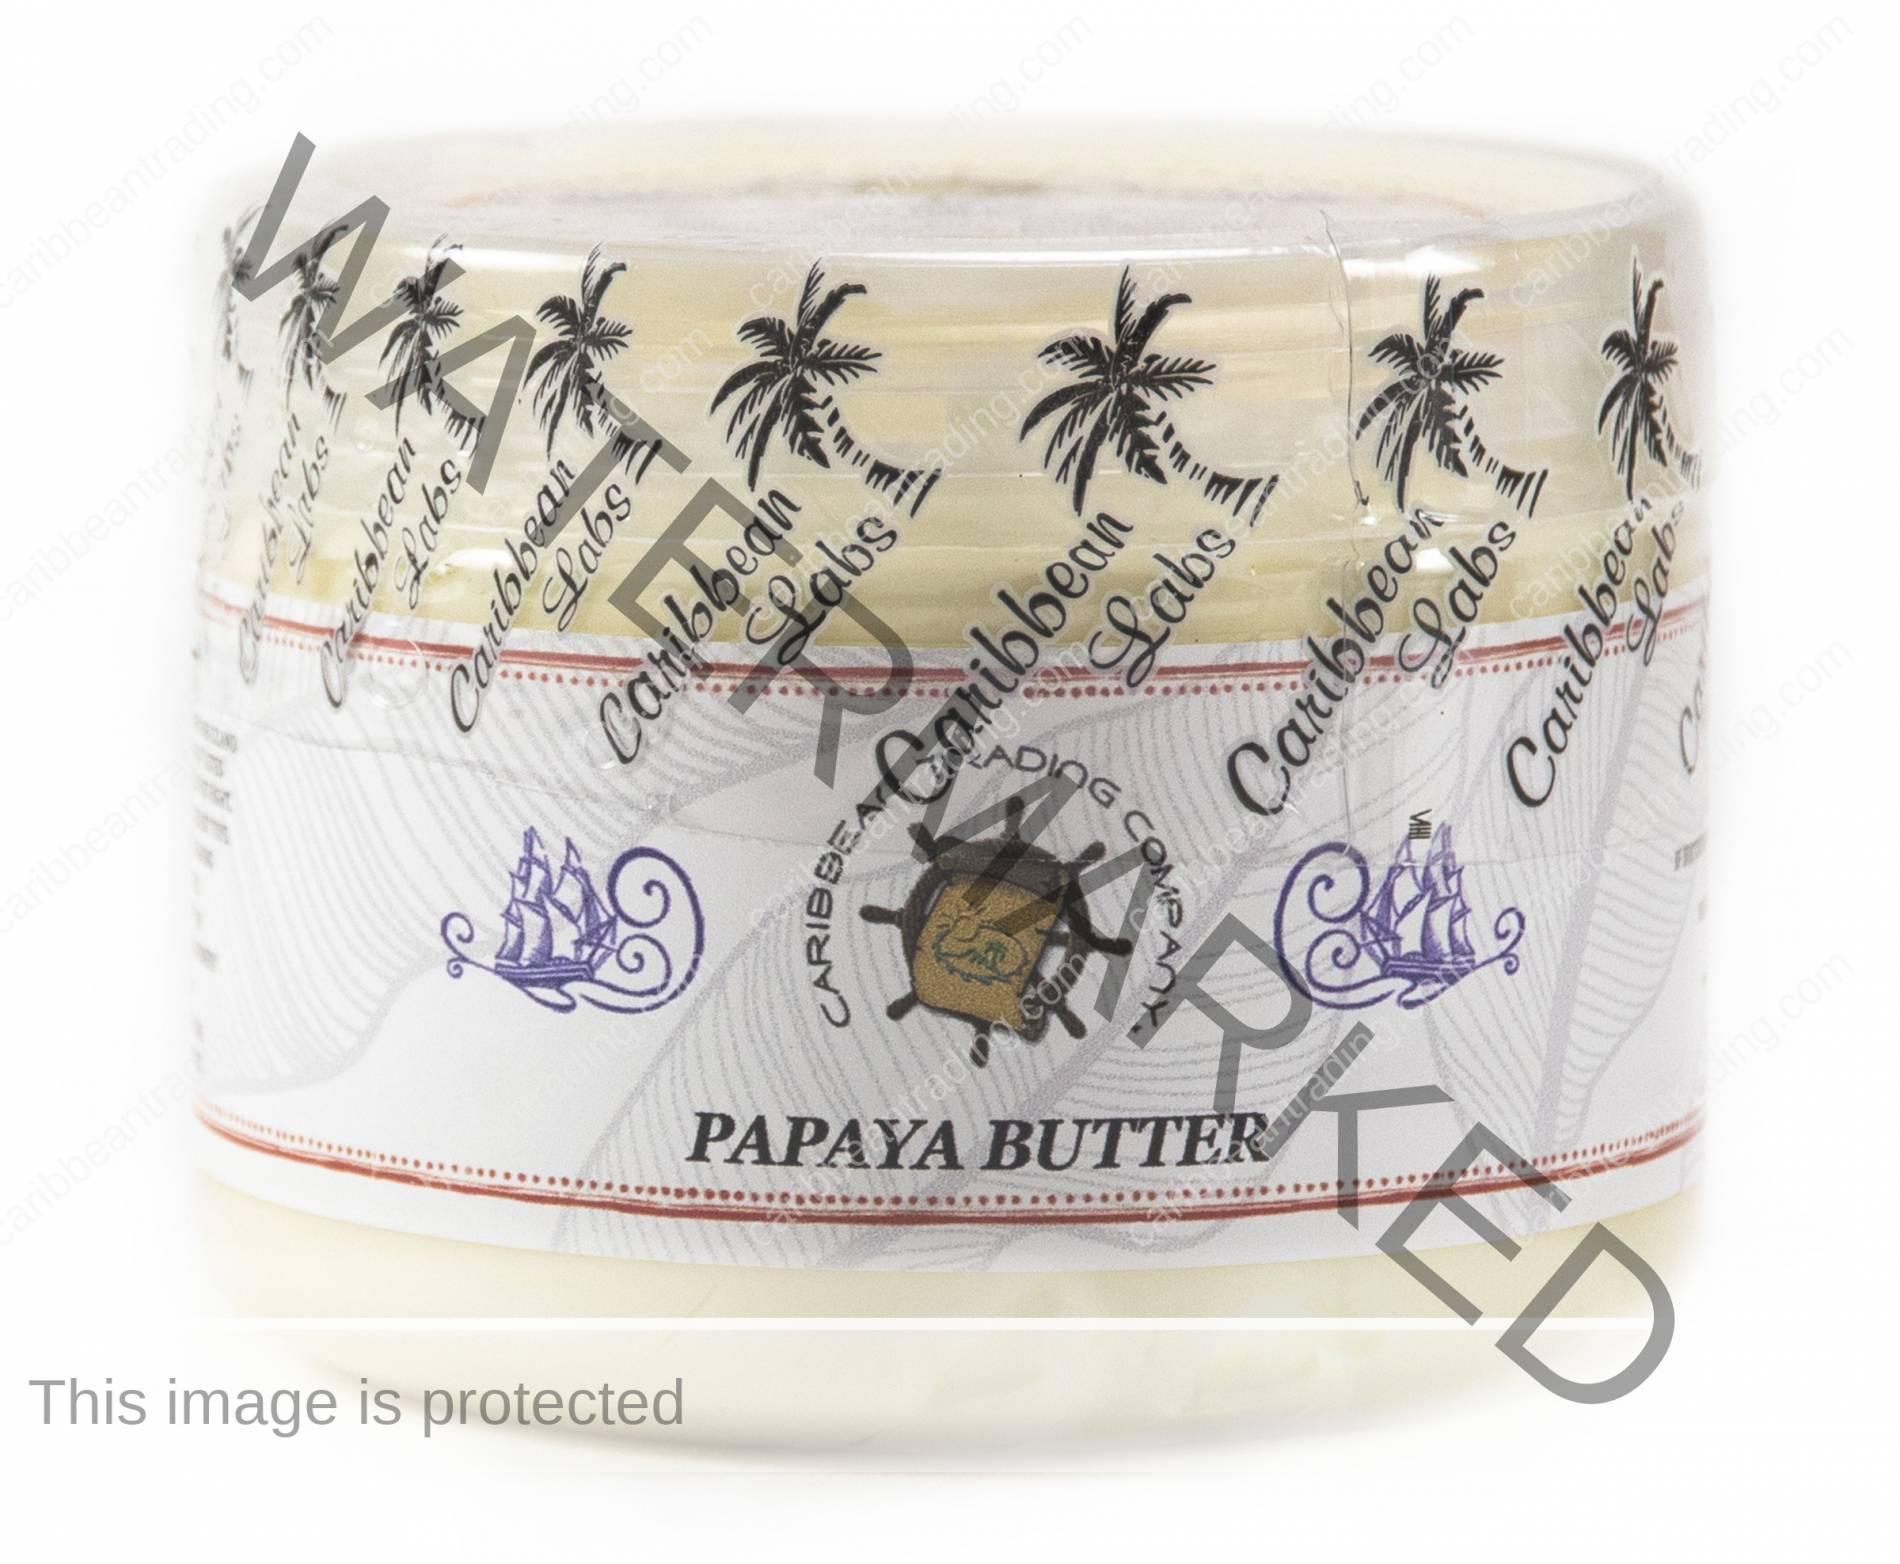 Papaya Body Butter 8 oz.